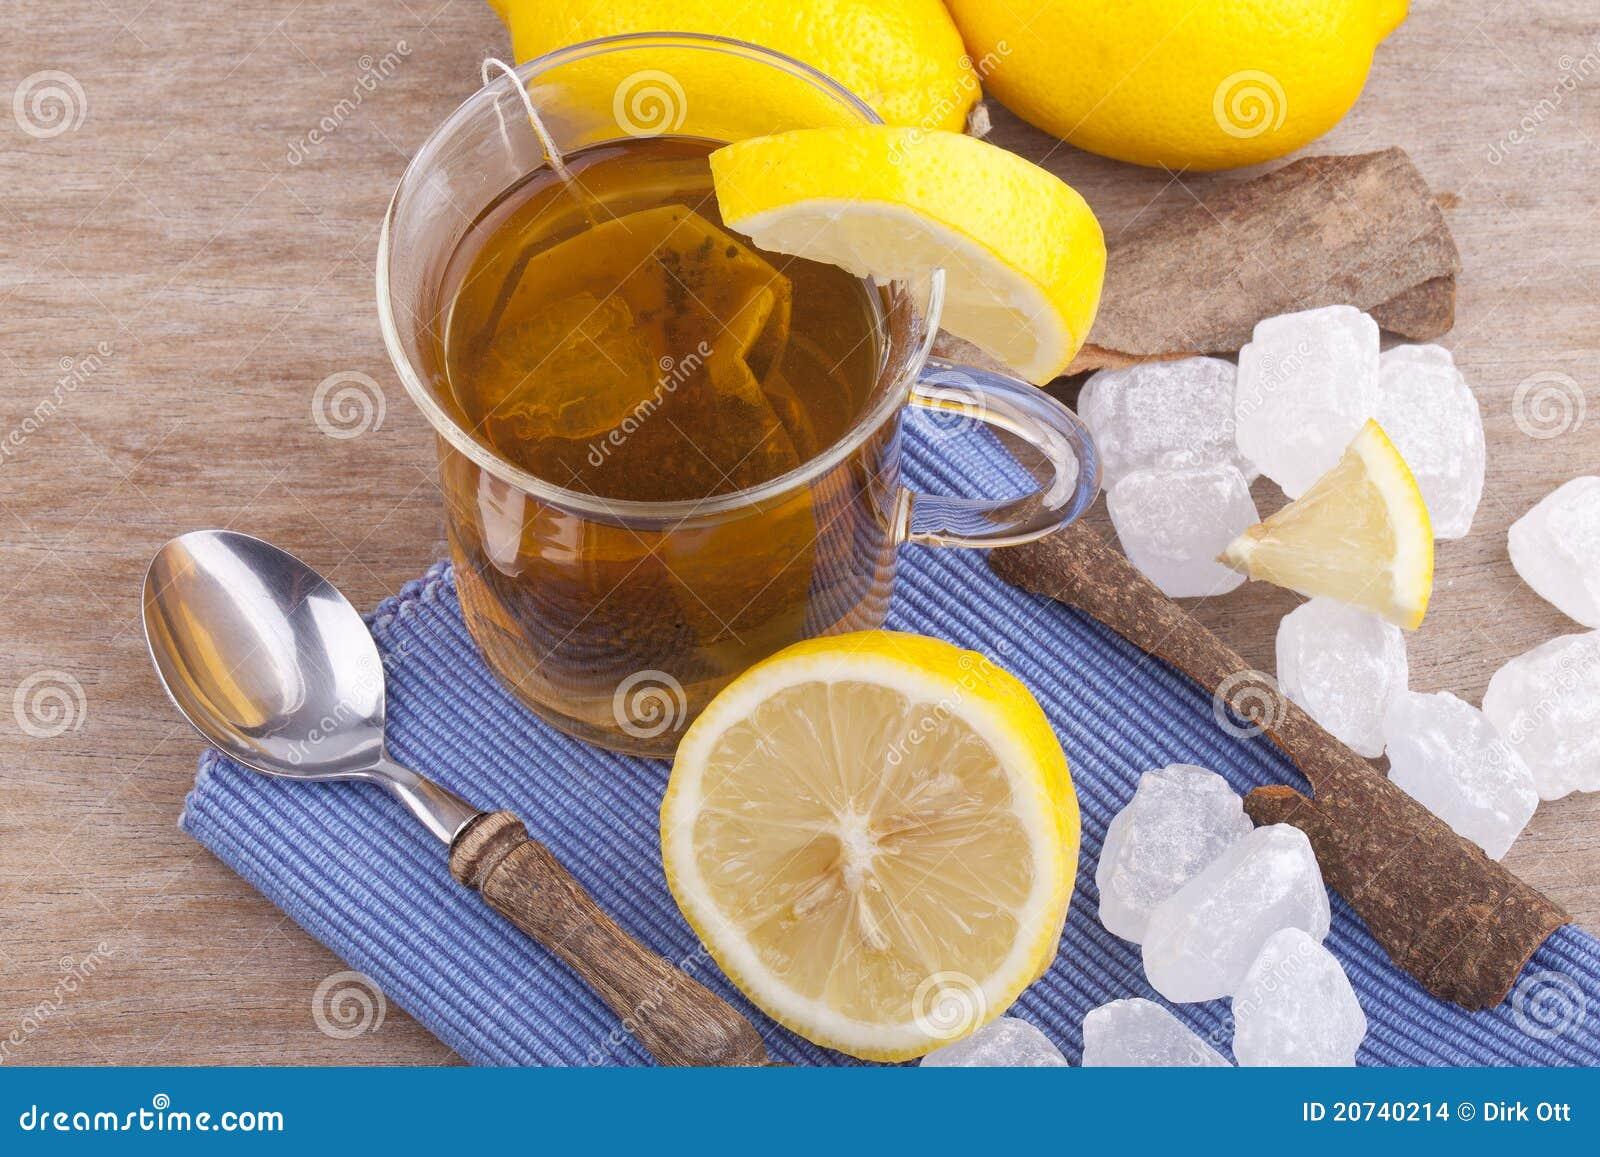 how to make hot lemon tea